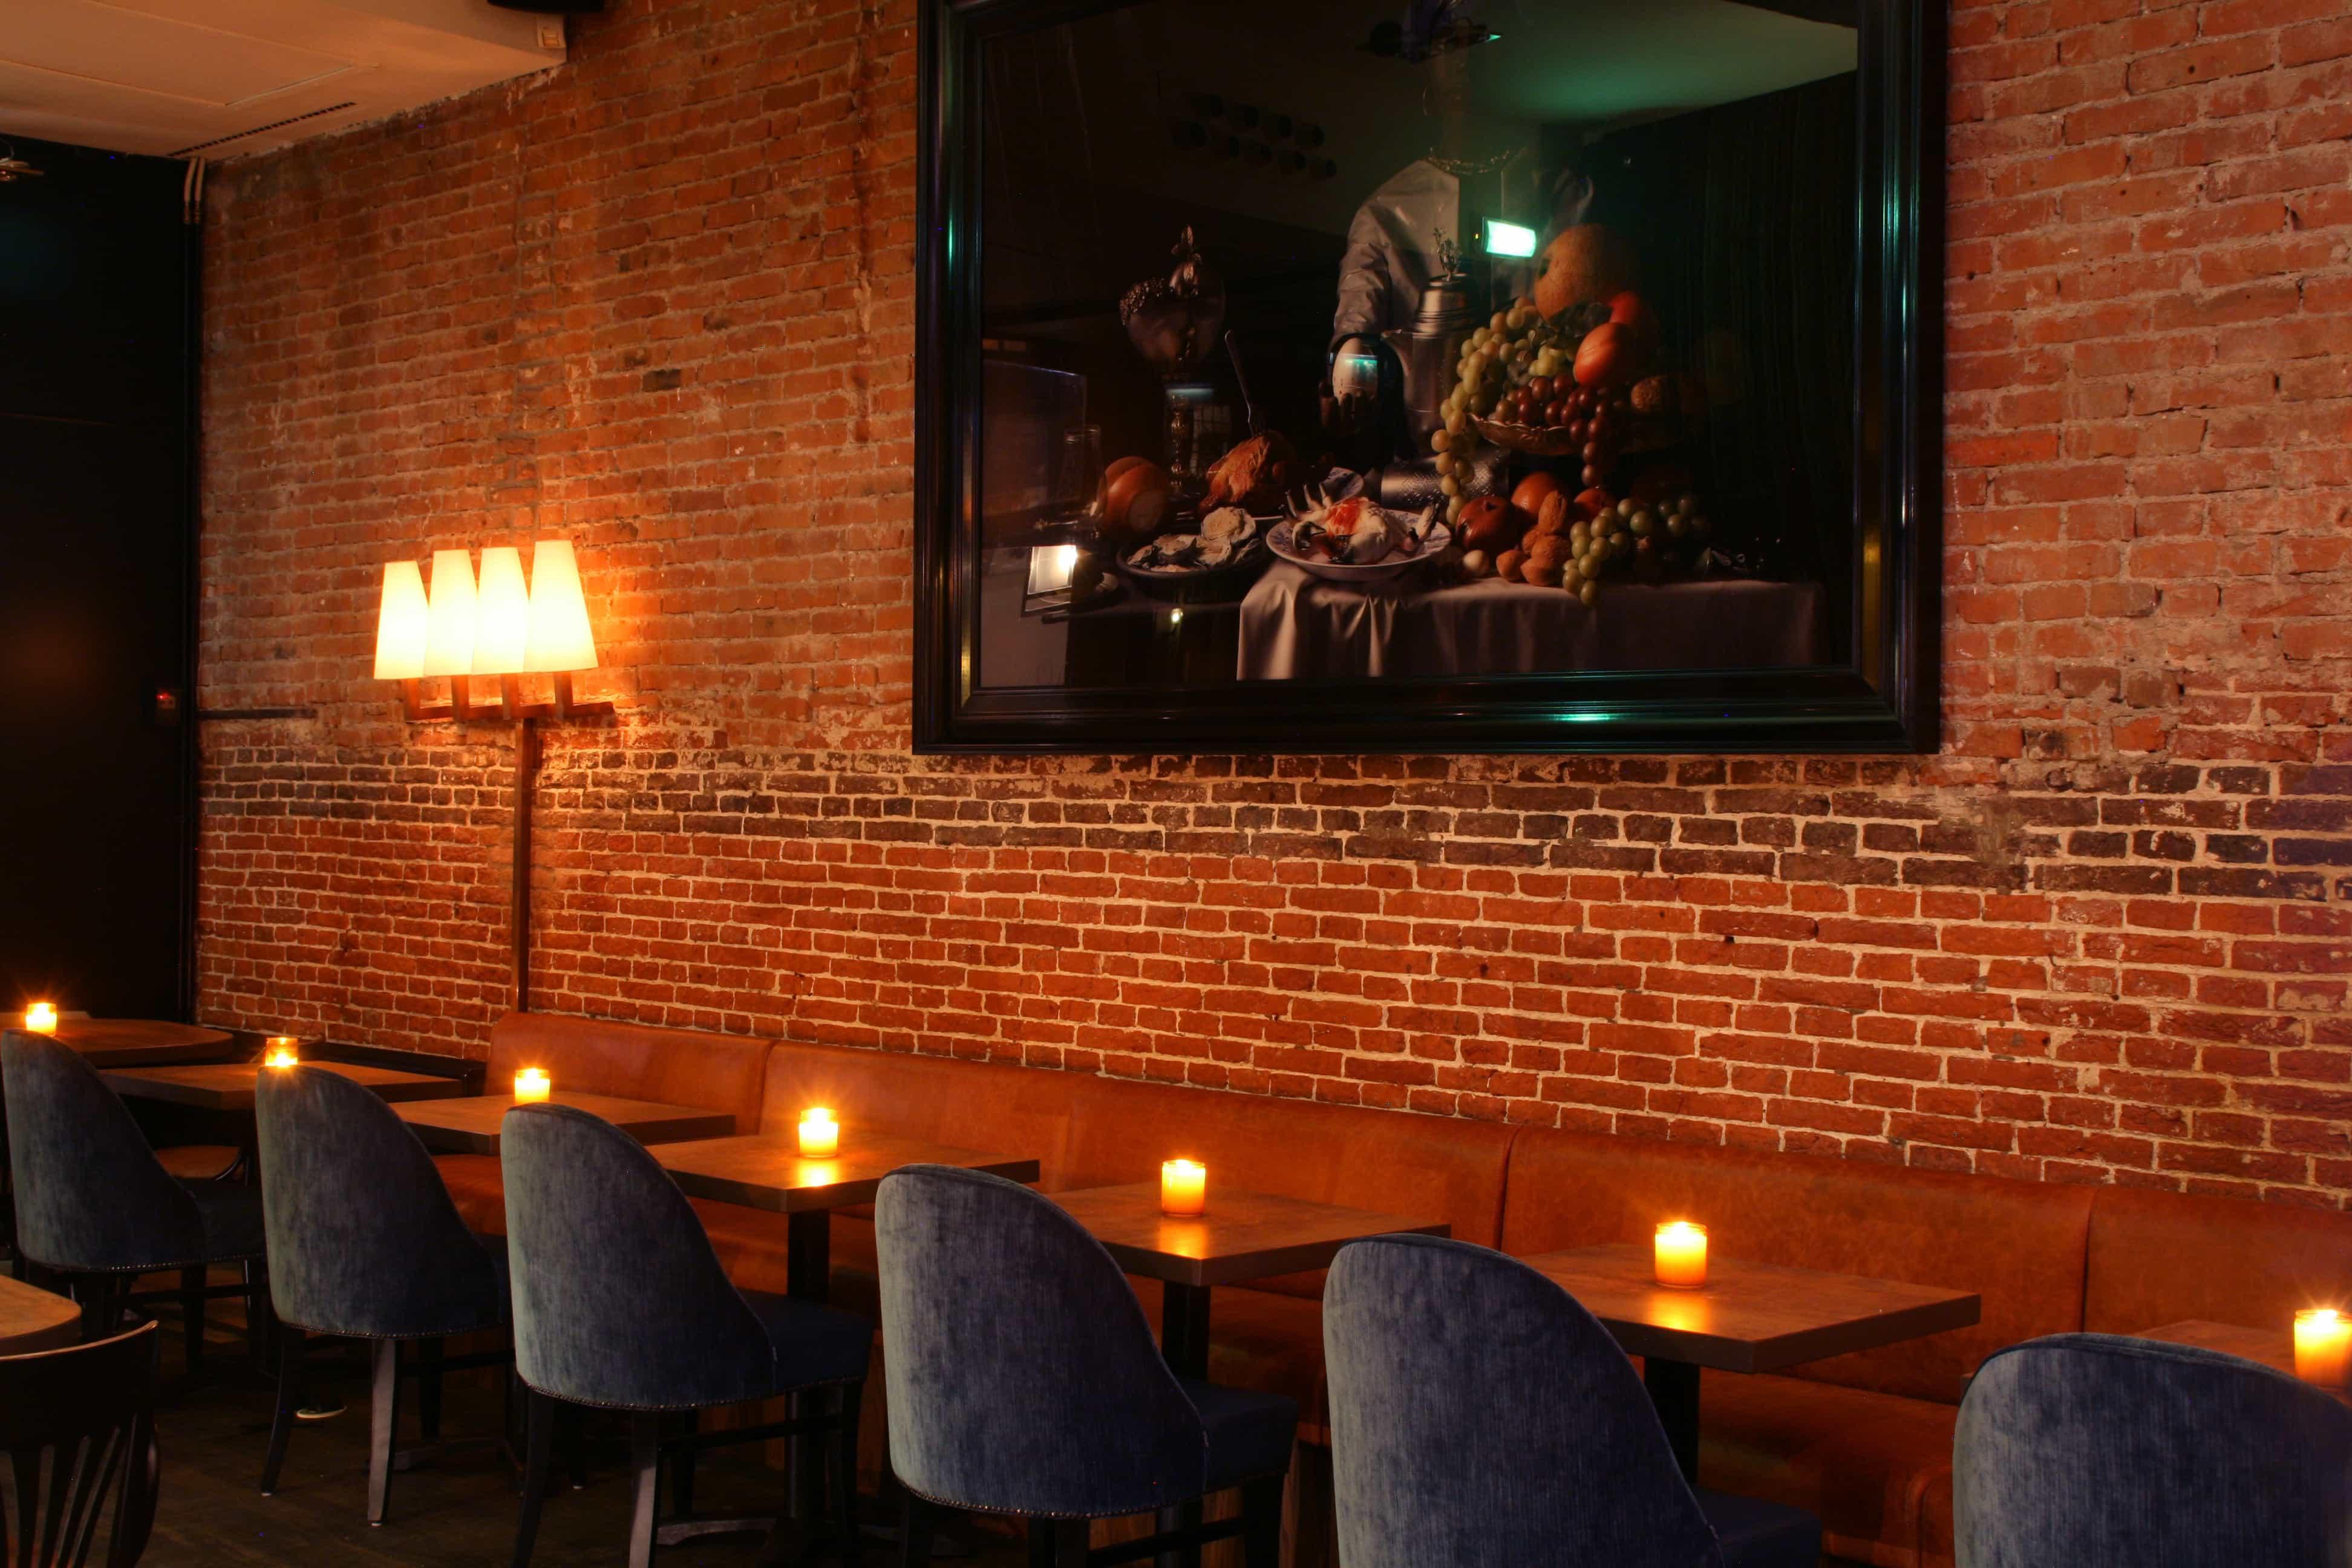 Indeling Keuken Restaurant : restaurant amsterdam, franse keuken amsterdam, hollandse keuken